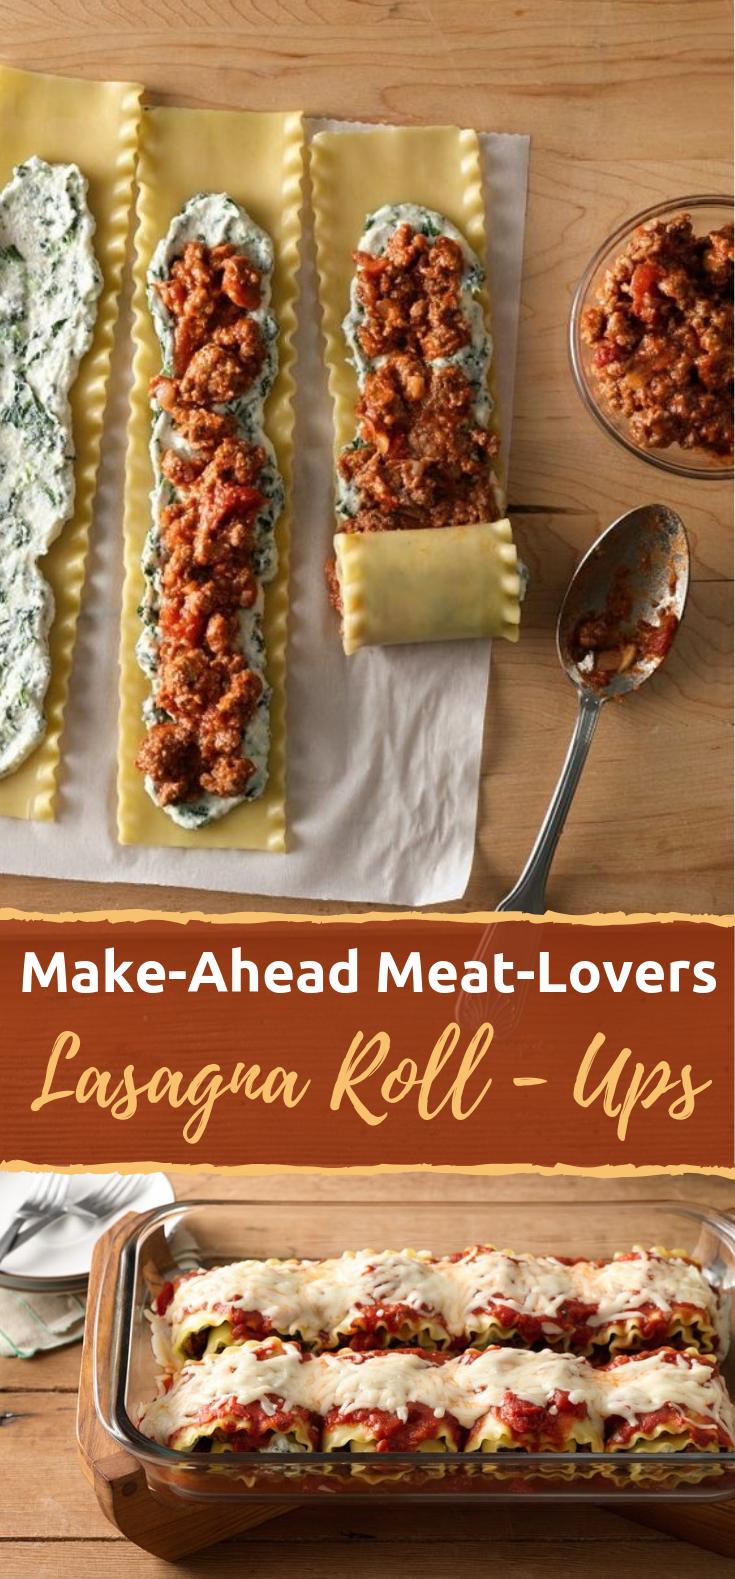 food dinner #food #foods Make-Ahead Meat-Lovers Lasagna Roll-Ups #Dinner #Meals